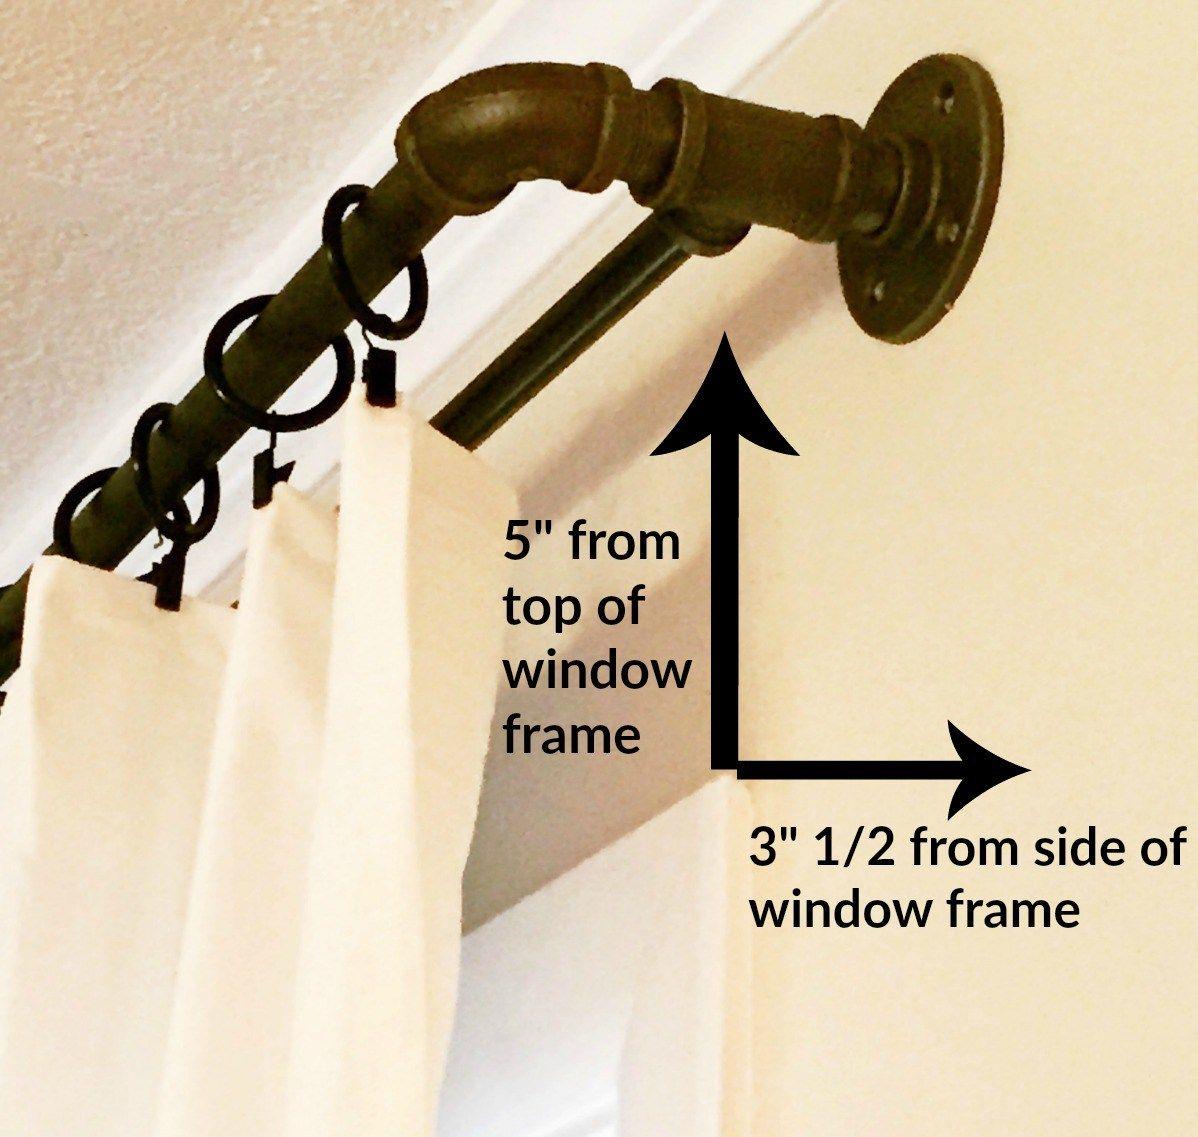 diy double industrial conduit curtain rod window house. Black Bedroom Furniture Sets. Home Design Ideas